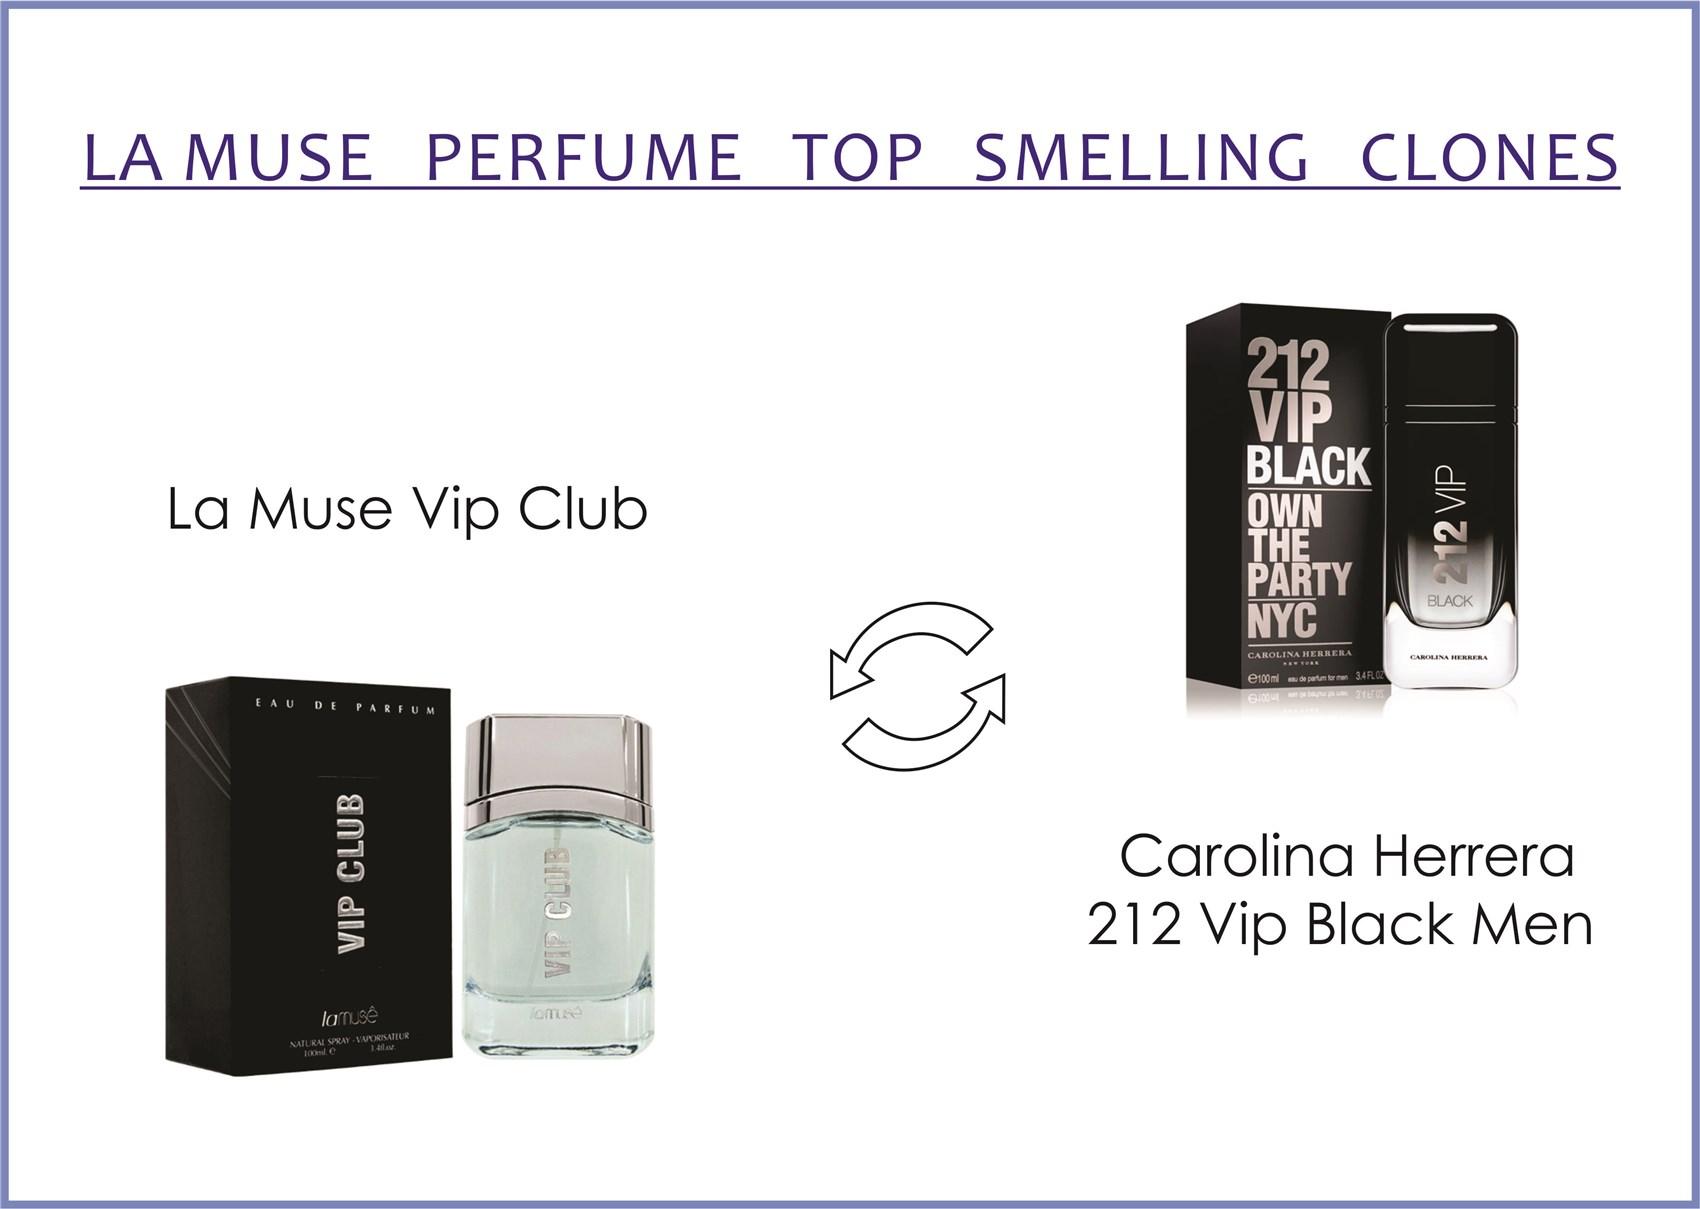 la-muse-vip-club-for-men-100-ml-edp-by-lattafa-perfumes-carolina-herrera-212-vip-men-by-carolina-herrera-perfume-for-men-100